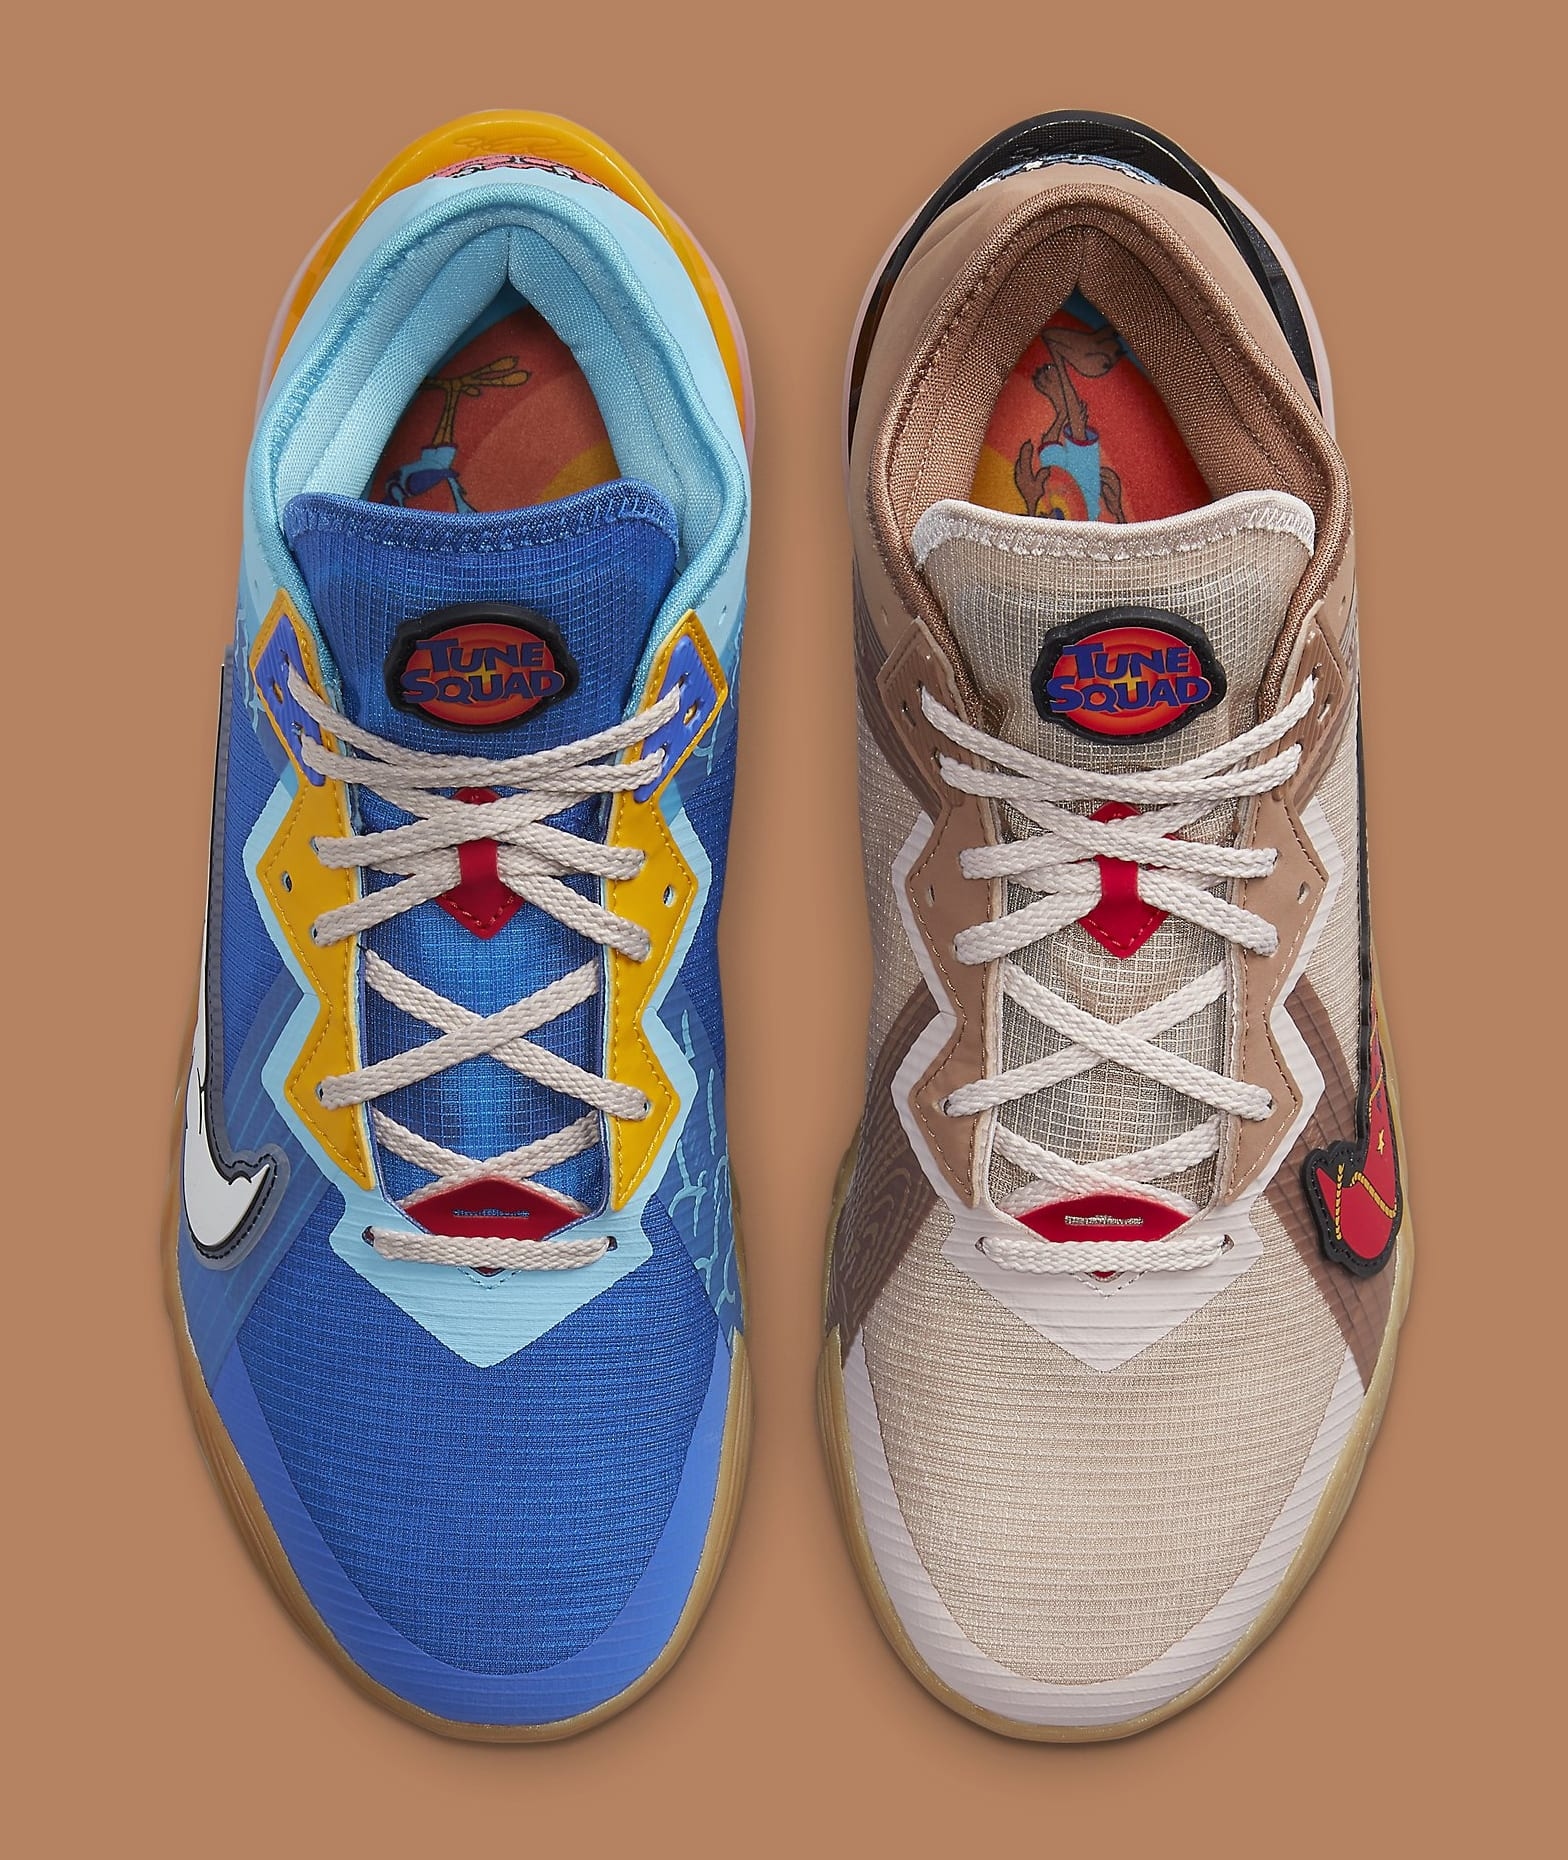 Xbox x Nike LeBron 18 Low 'Wile E. x Roadrunner' DO7172-900 Top